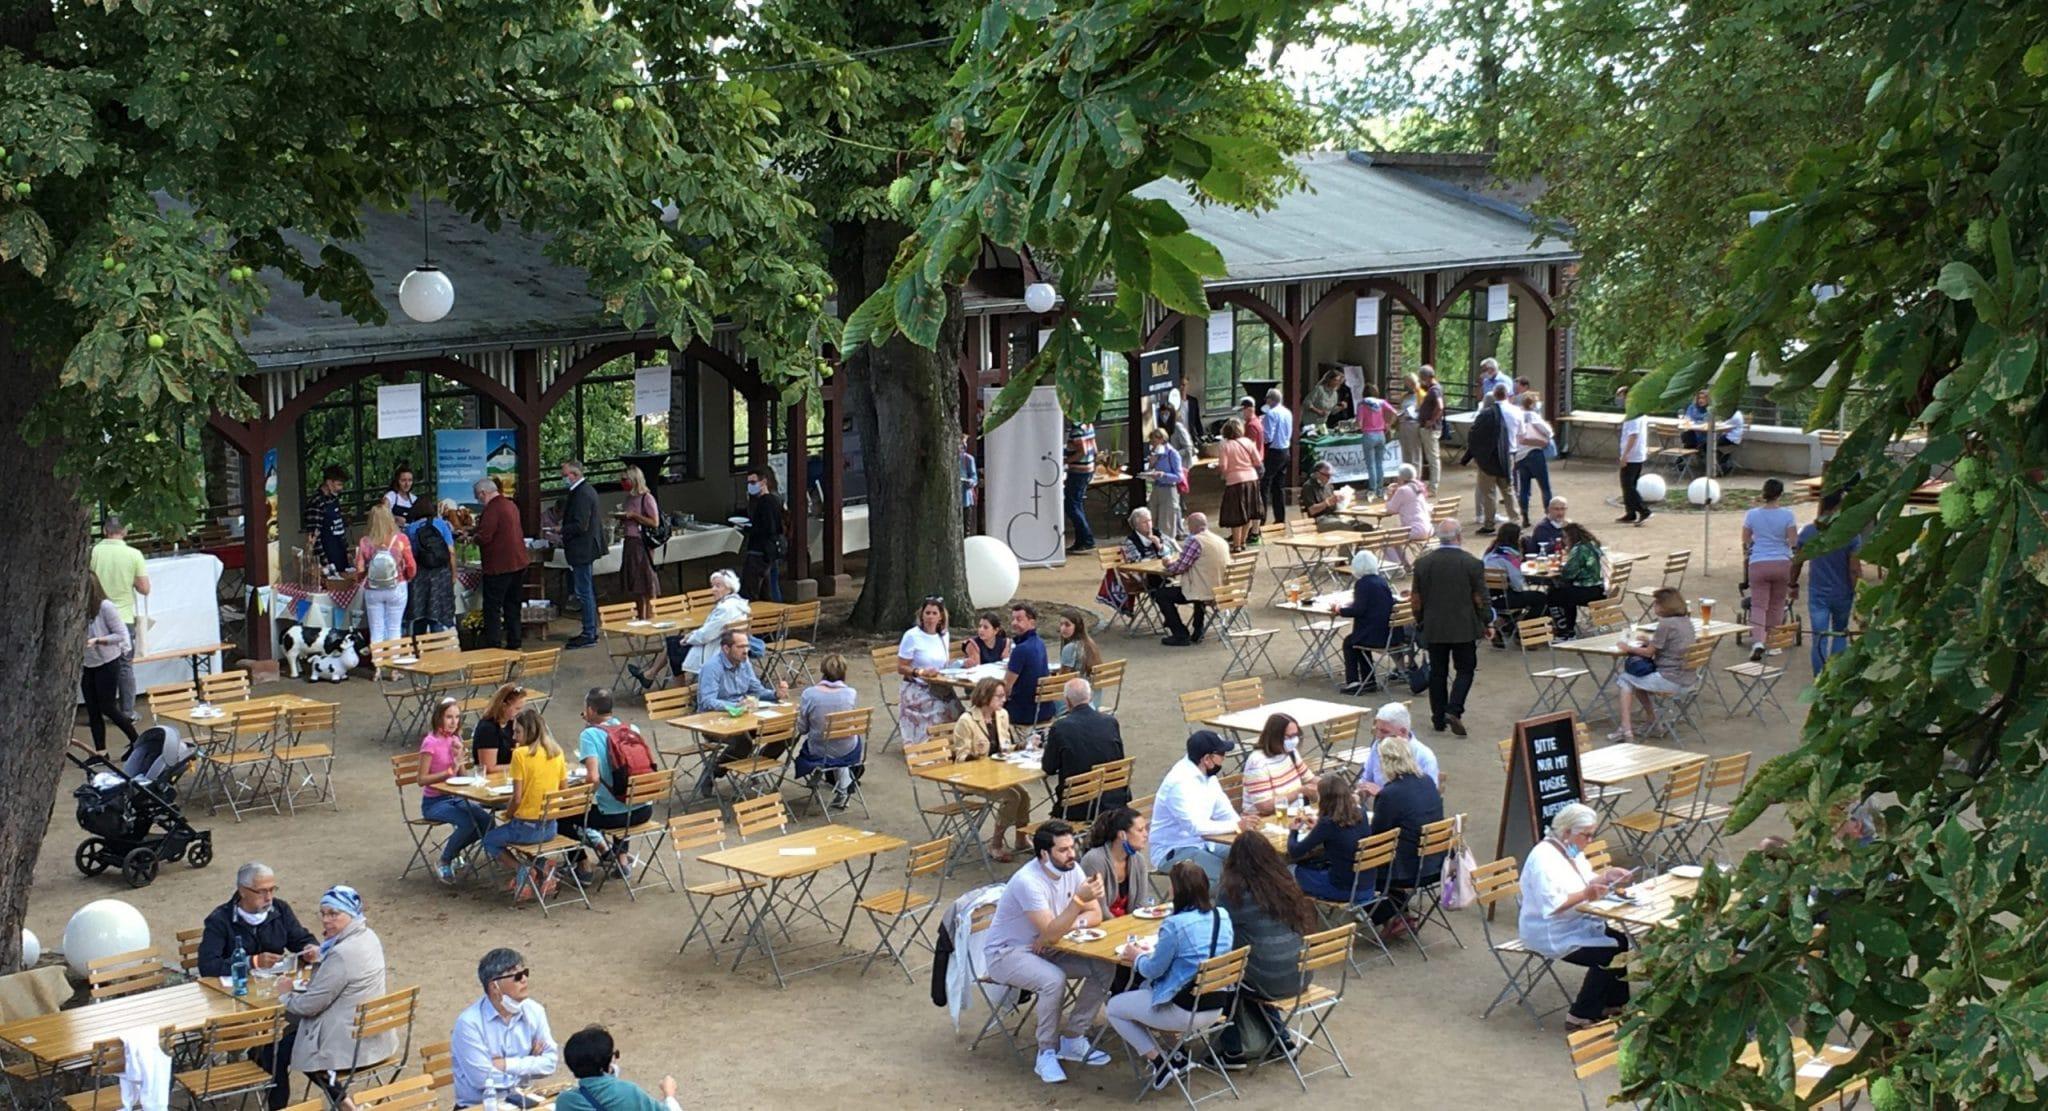 Bornheimer Ratskeller beer garden